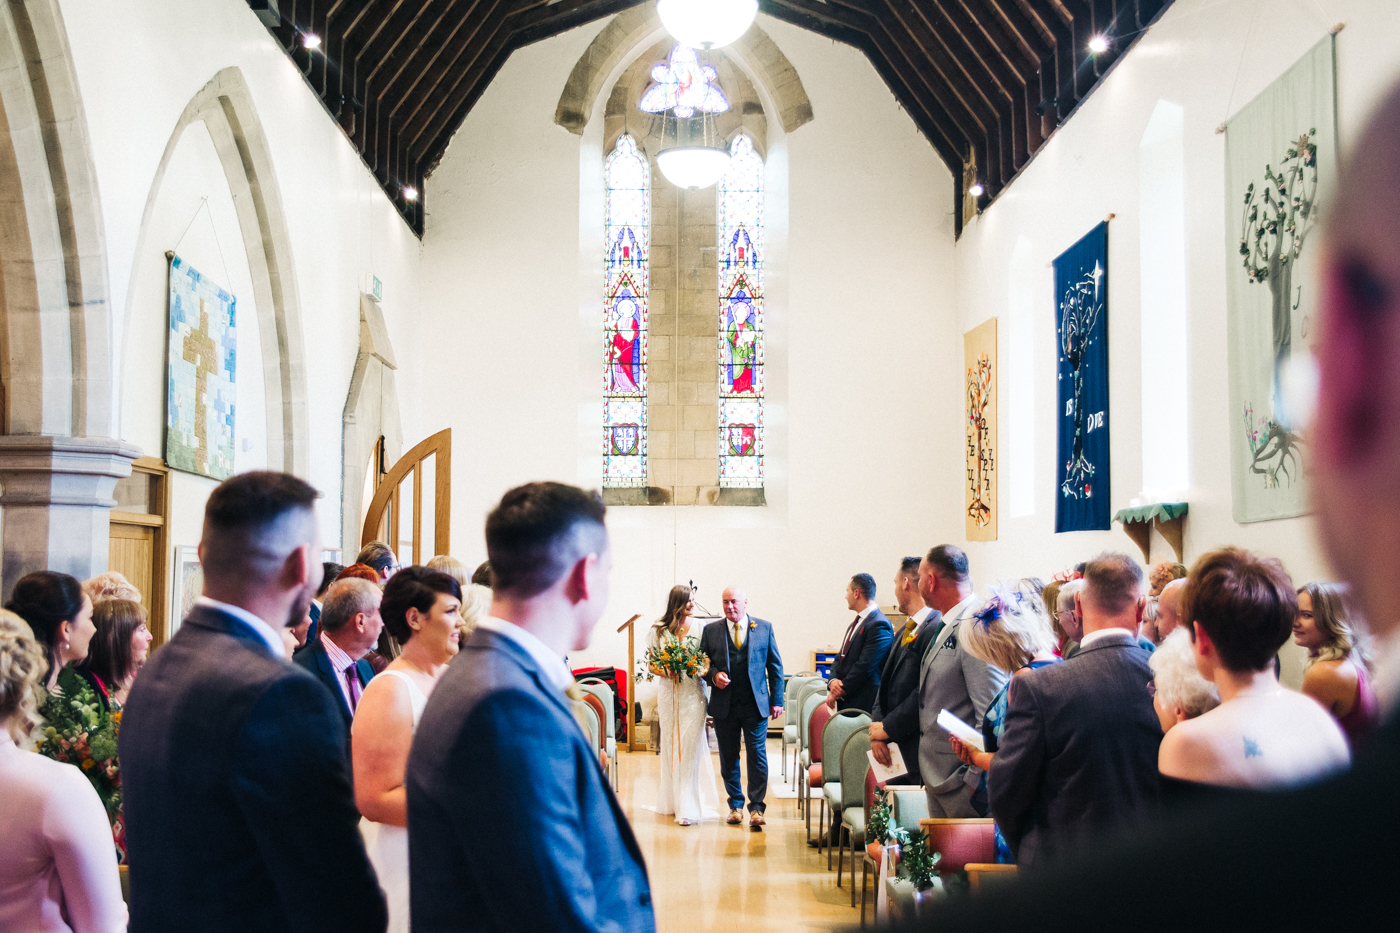 teesside-middlesbrough-north-east-wedding-photographer-creative-wedding-venues-0014.jpg